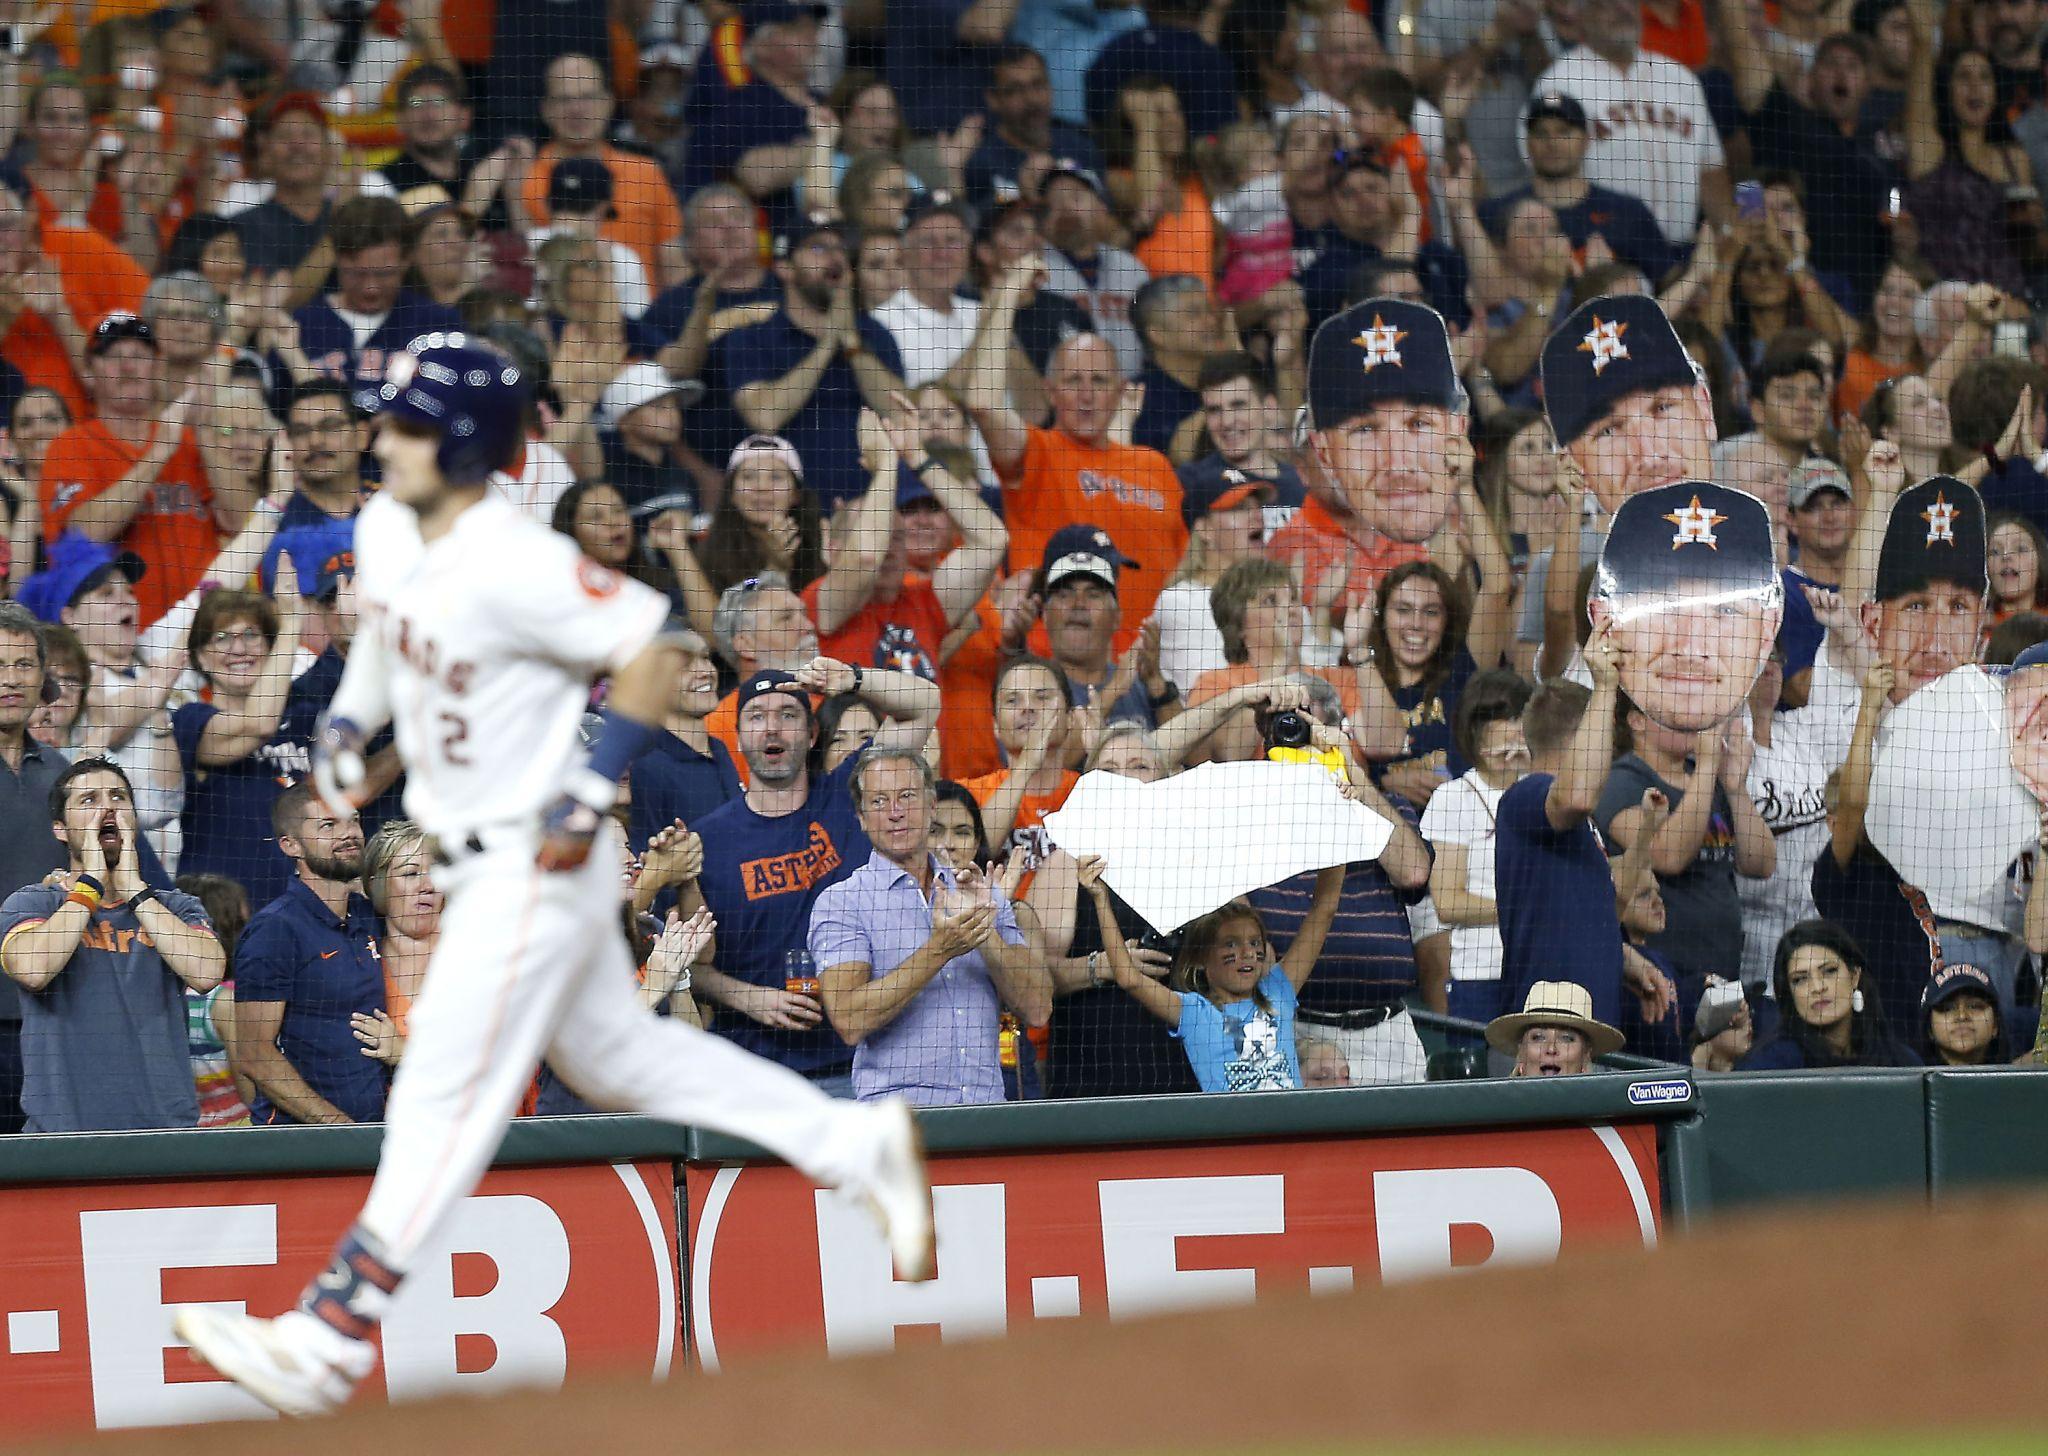 Astros' Alex Bregman nominated for MLB's Roberto Clemente Award